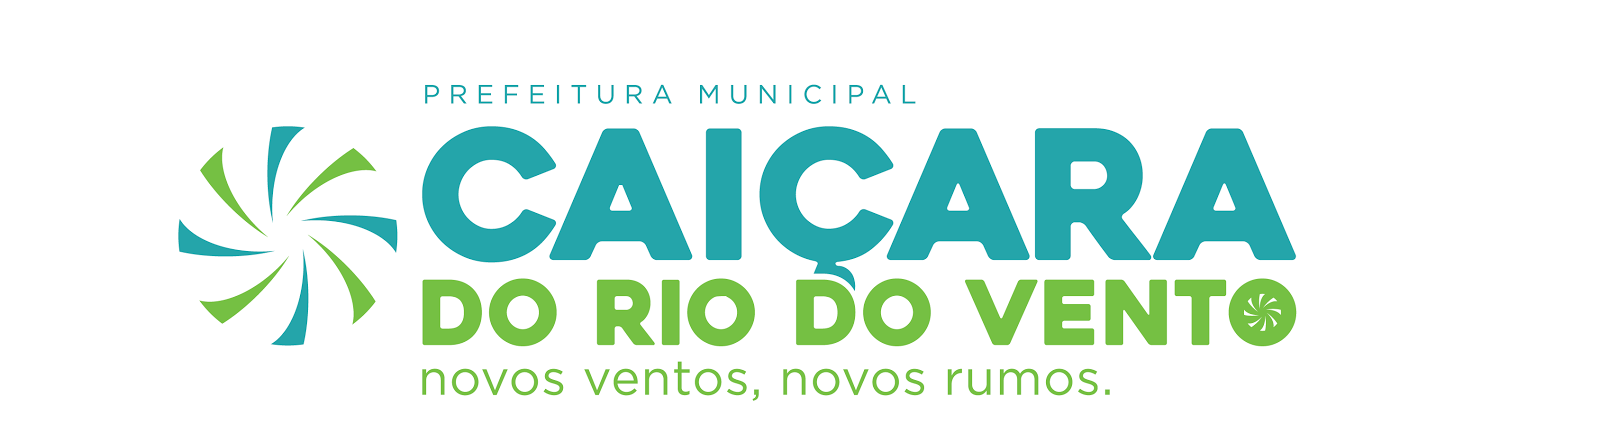 LOGOMARCA PREFEITURA DE CAIÇARA DO RIO DO VENTO RN